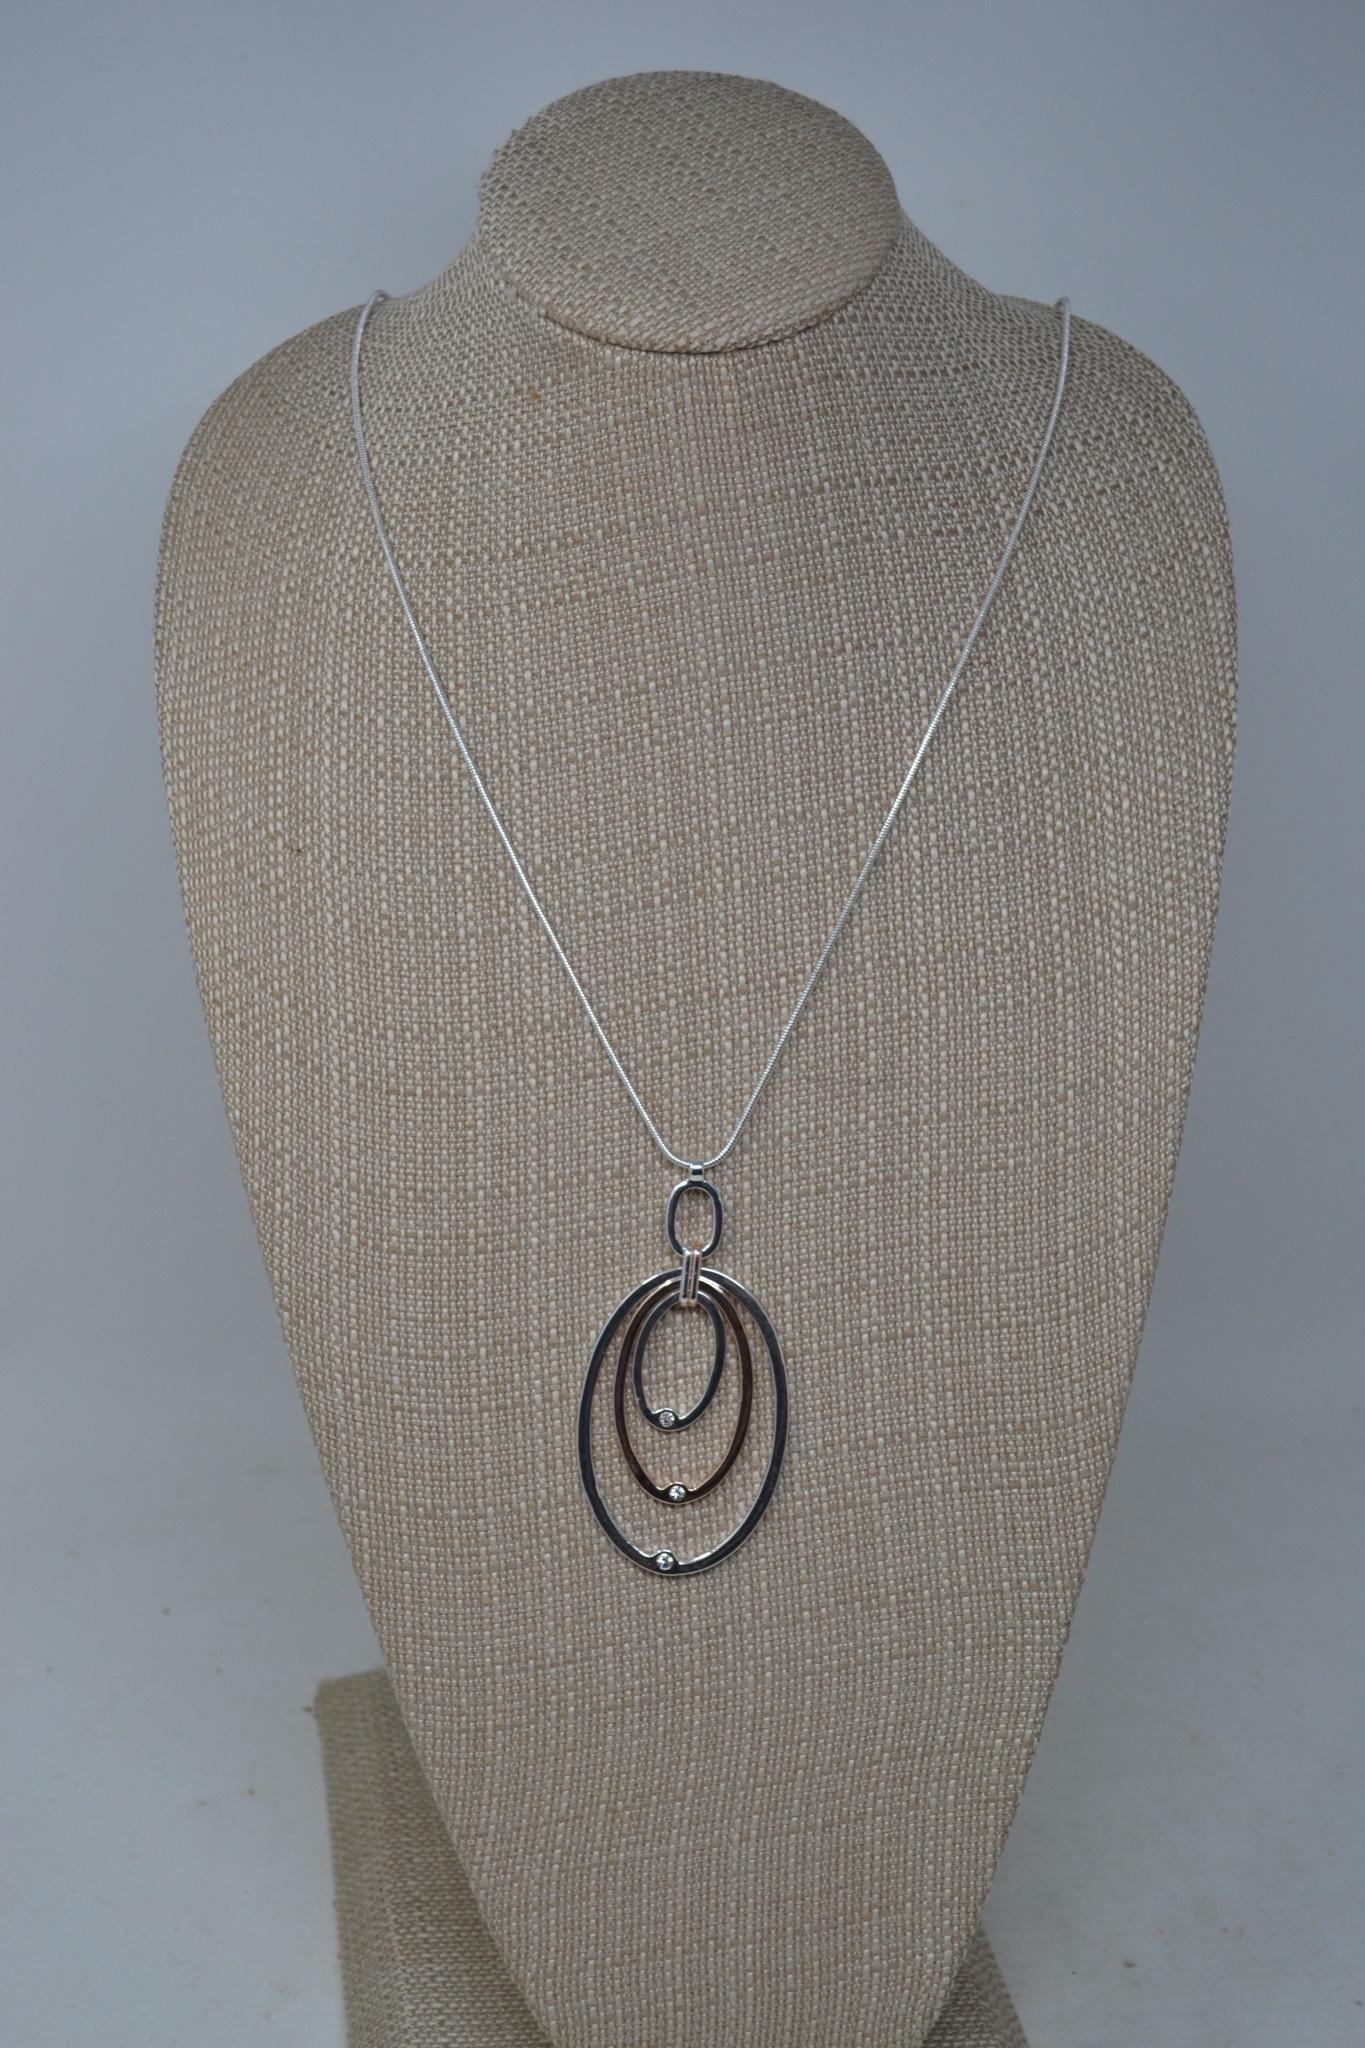 Rhinestone Multi-Oval Necklace